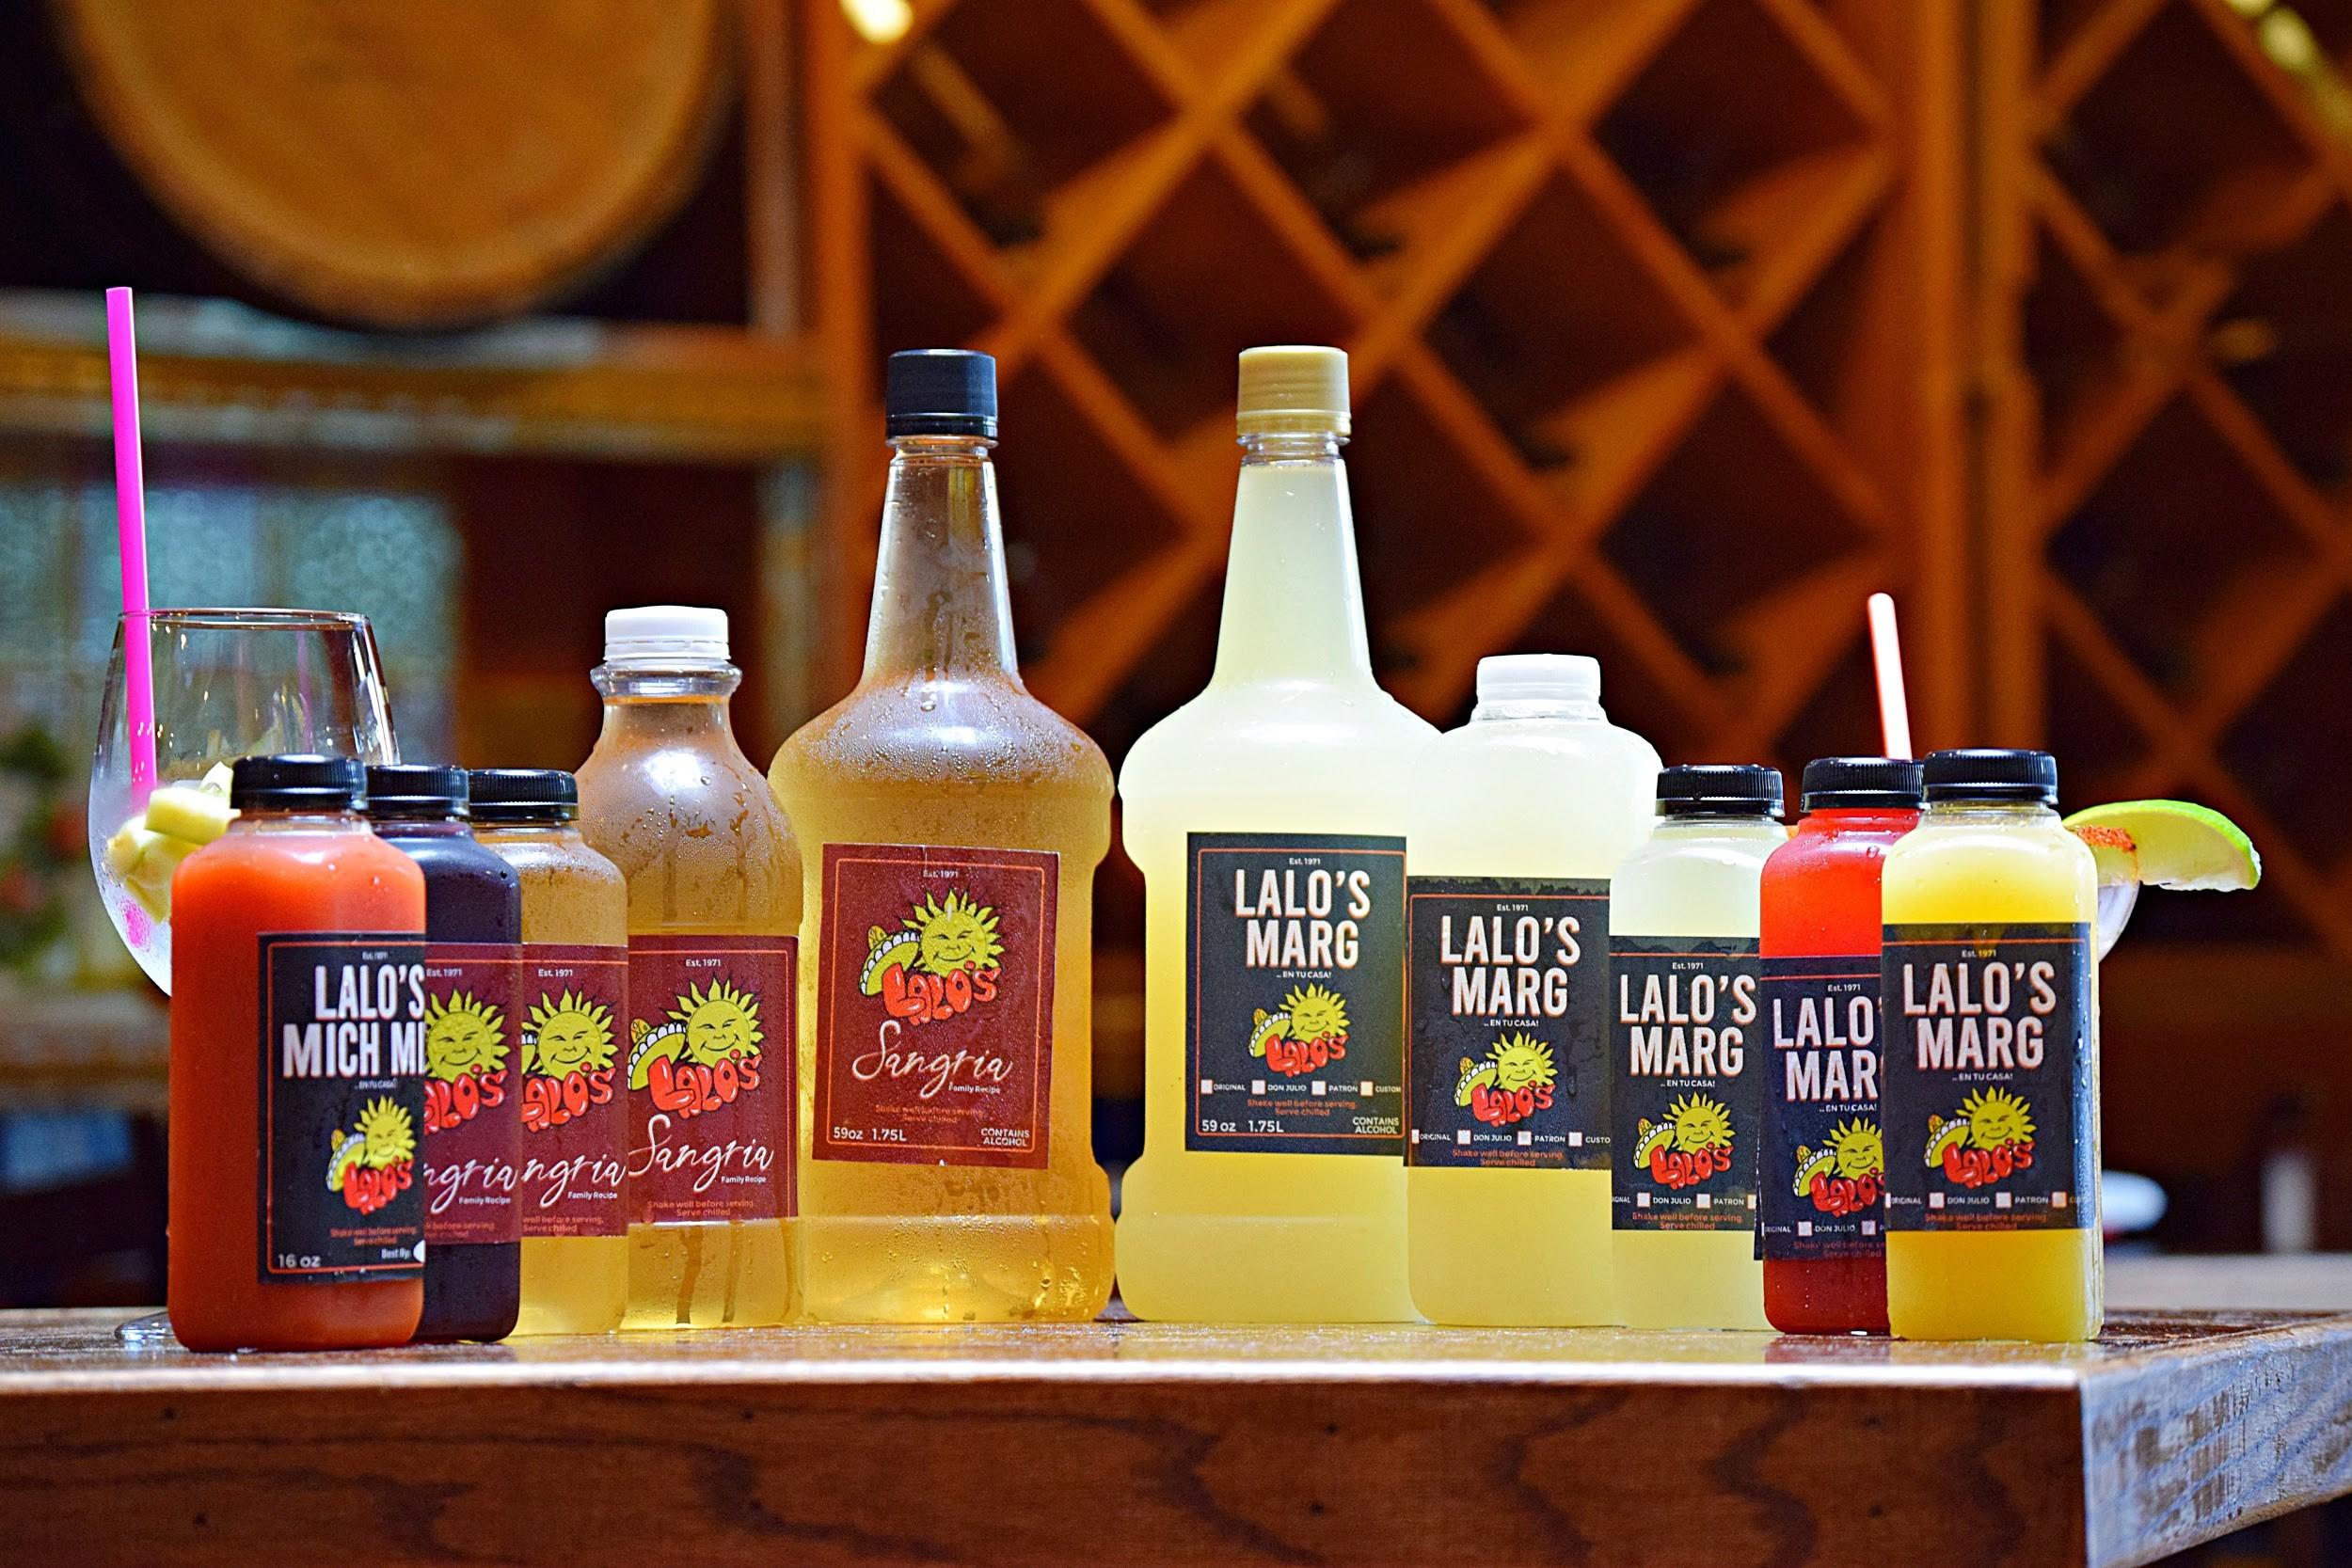 Lalo's: Famous Margaritas, Sangria and Micheladas To-Go